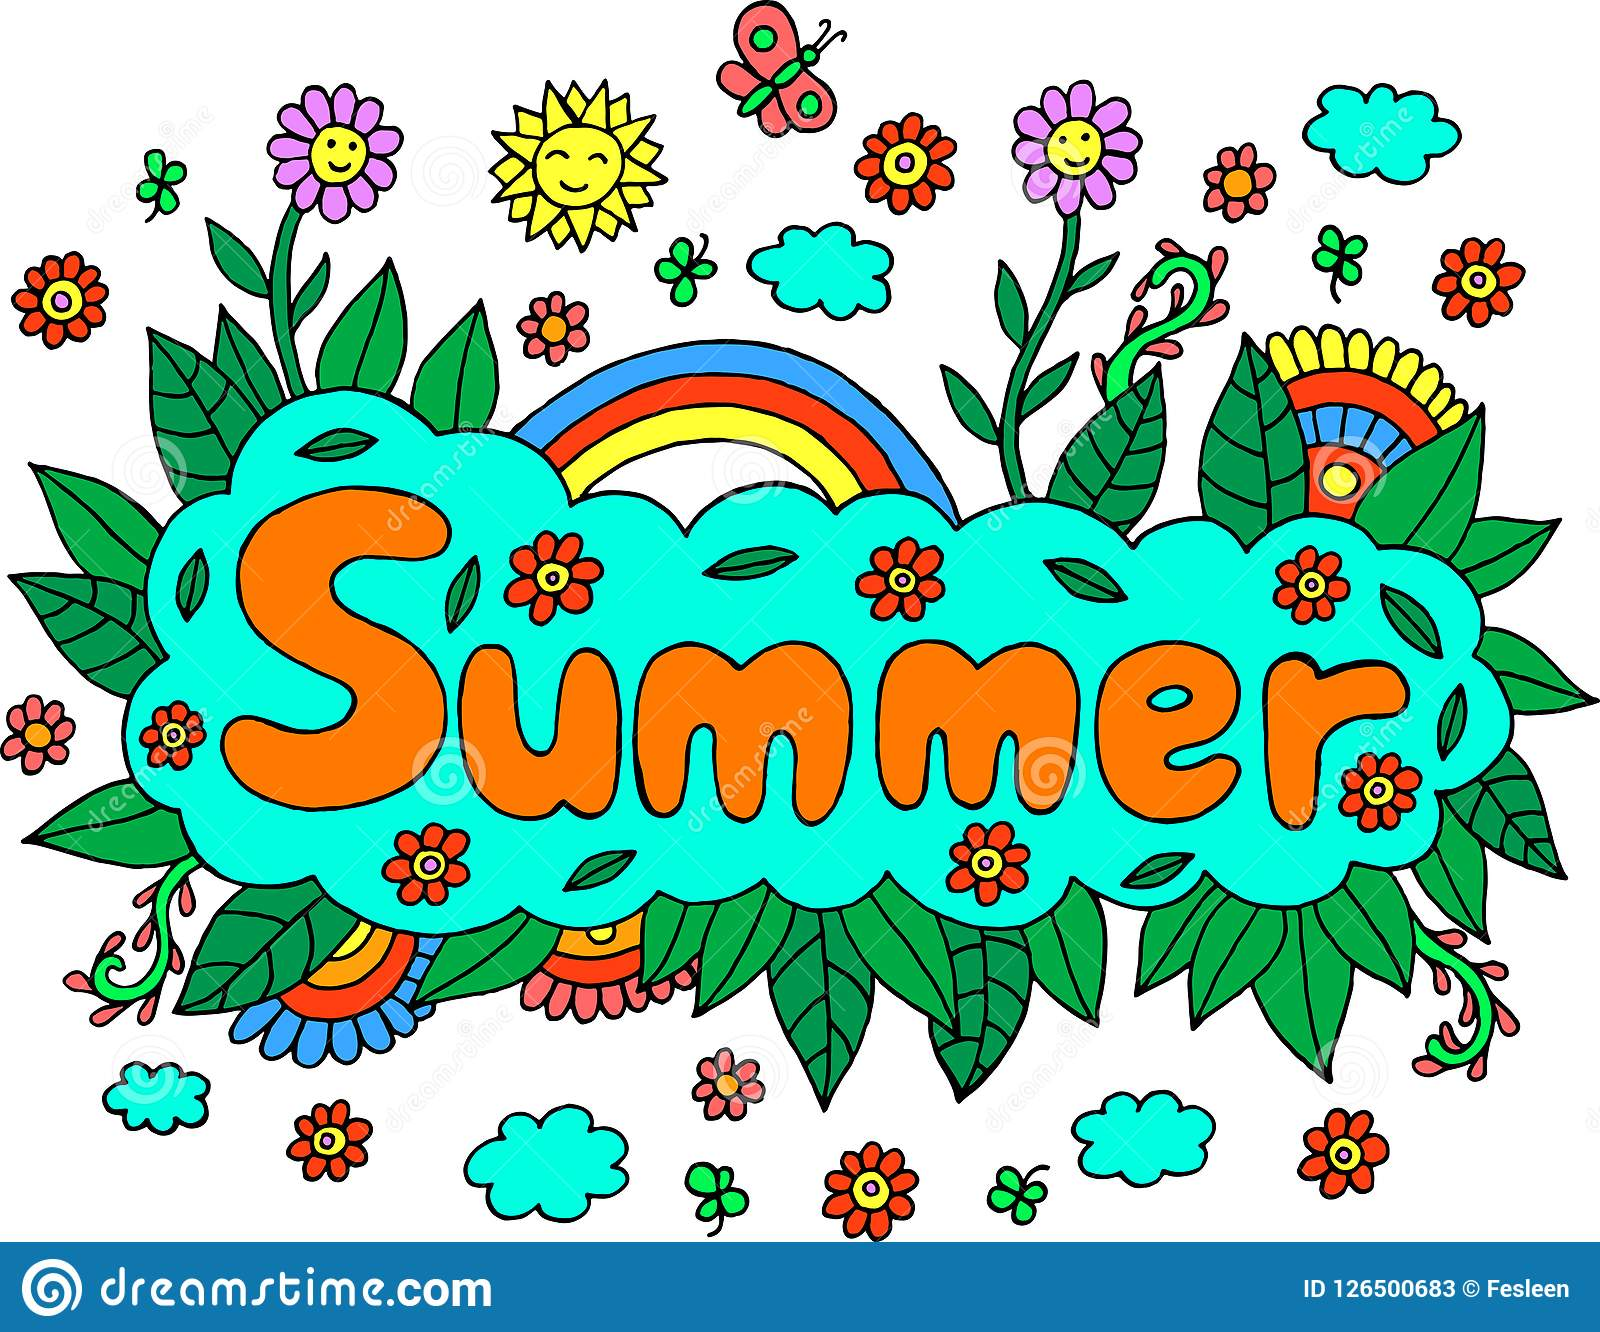 Mandala And Summer Word Doodle Lettering Colorful Artwork